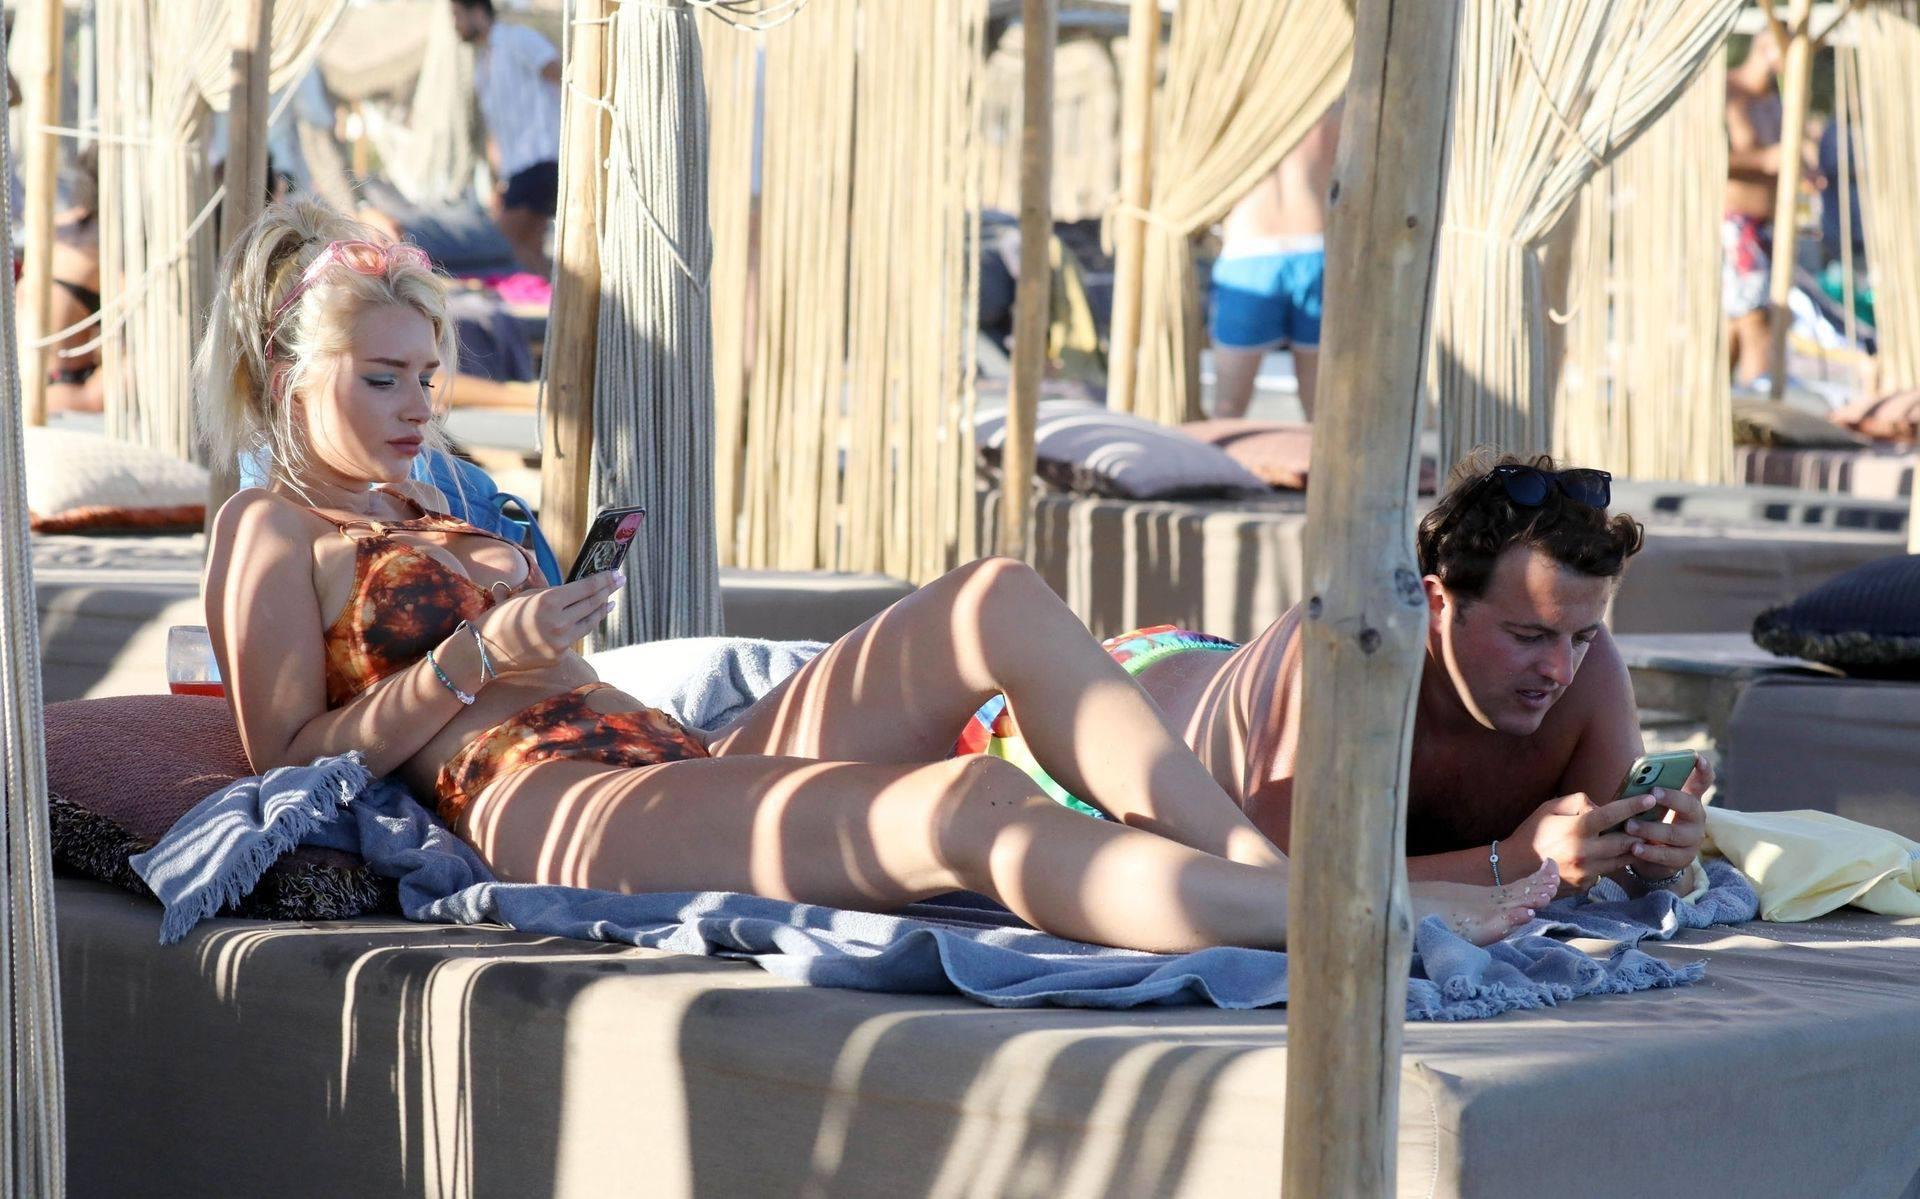 Lottie Moss Beautiful In Bikini